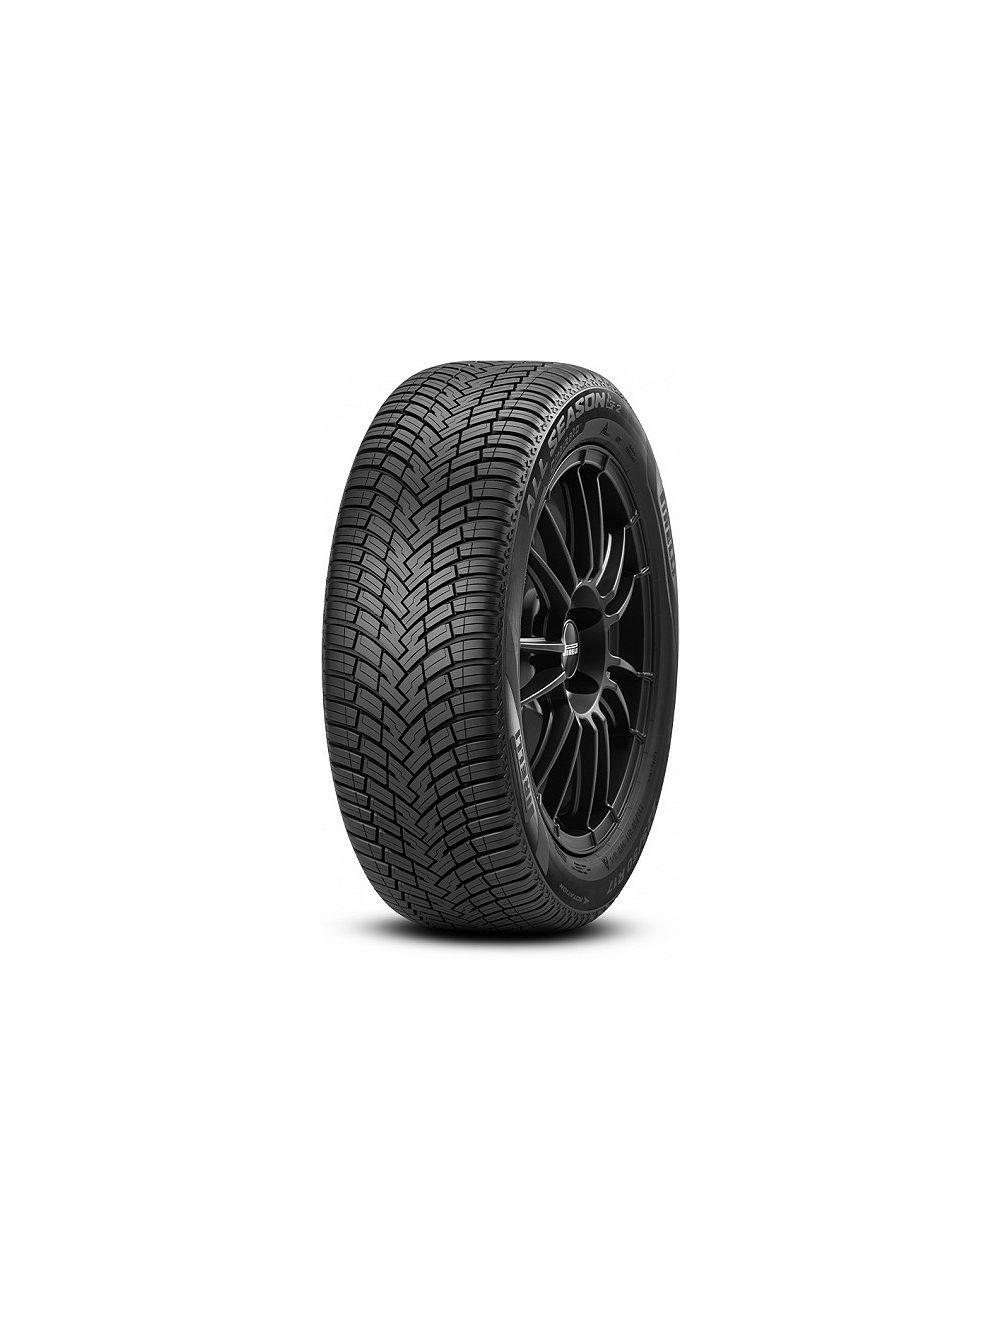 Pirelli 215/50R18 W Cinturato All Season SF2 Négyévszakos gumi